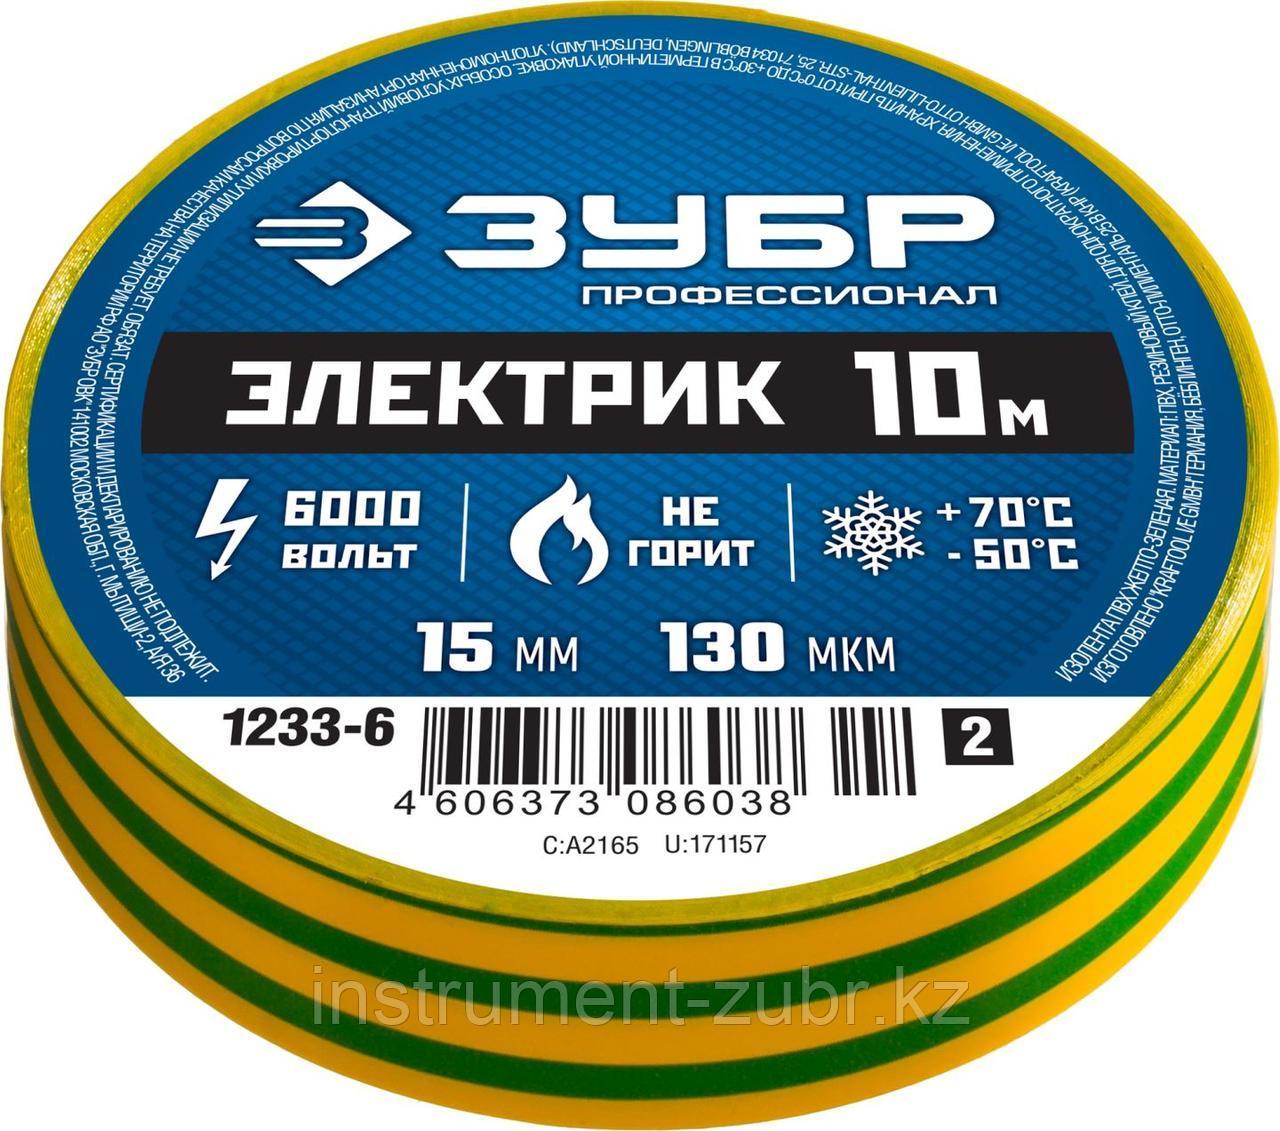 Желто-зеленая изолента ПВХ, 10м х 15мм, ЗУБР Электрик-10